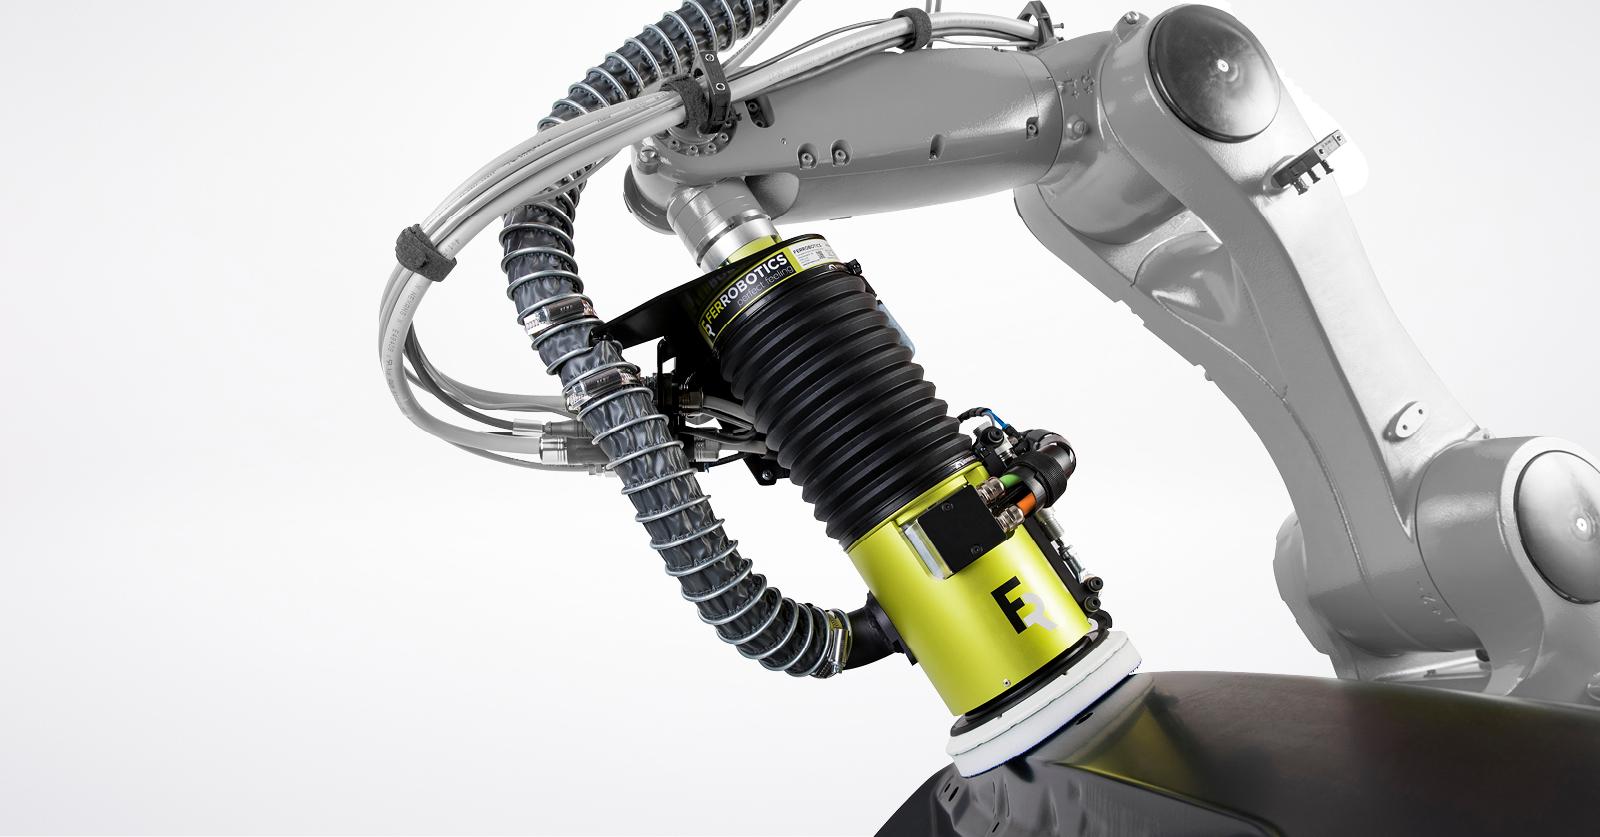 Systemintegrator FerRobotics Automatisierung automation robotic robotik schleifen sanding grinding polishing endeffektor